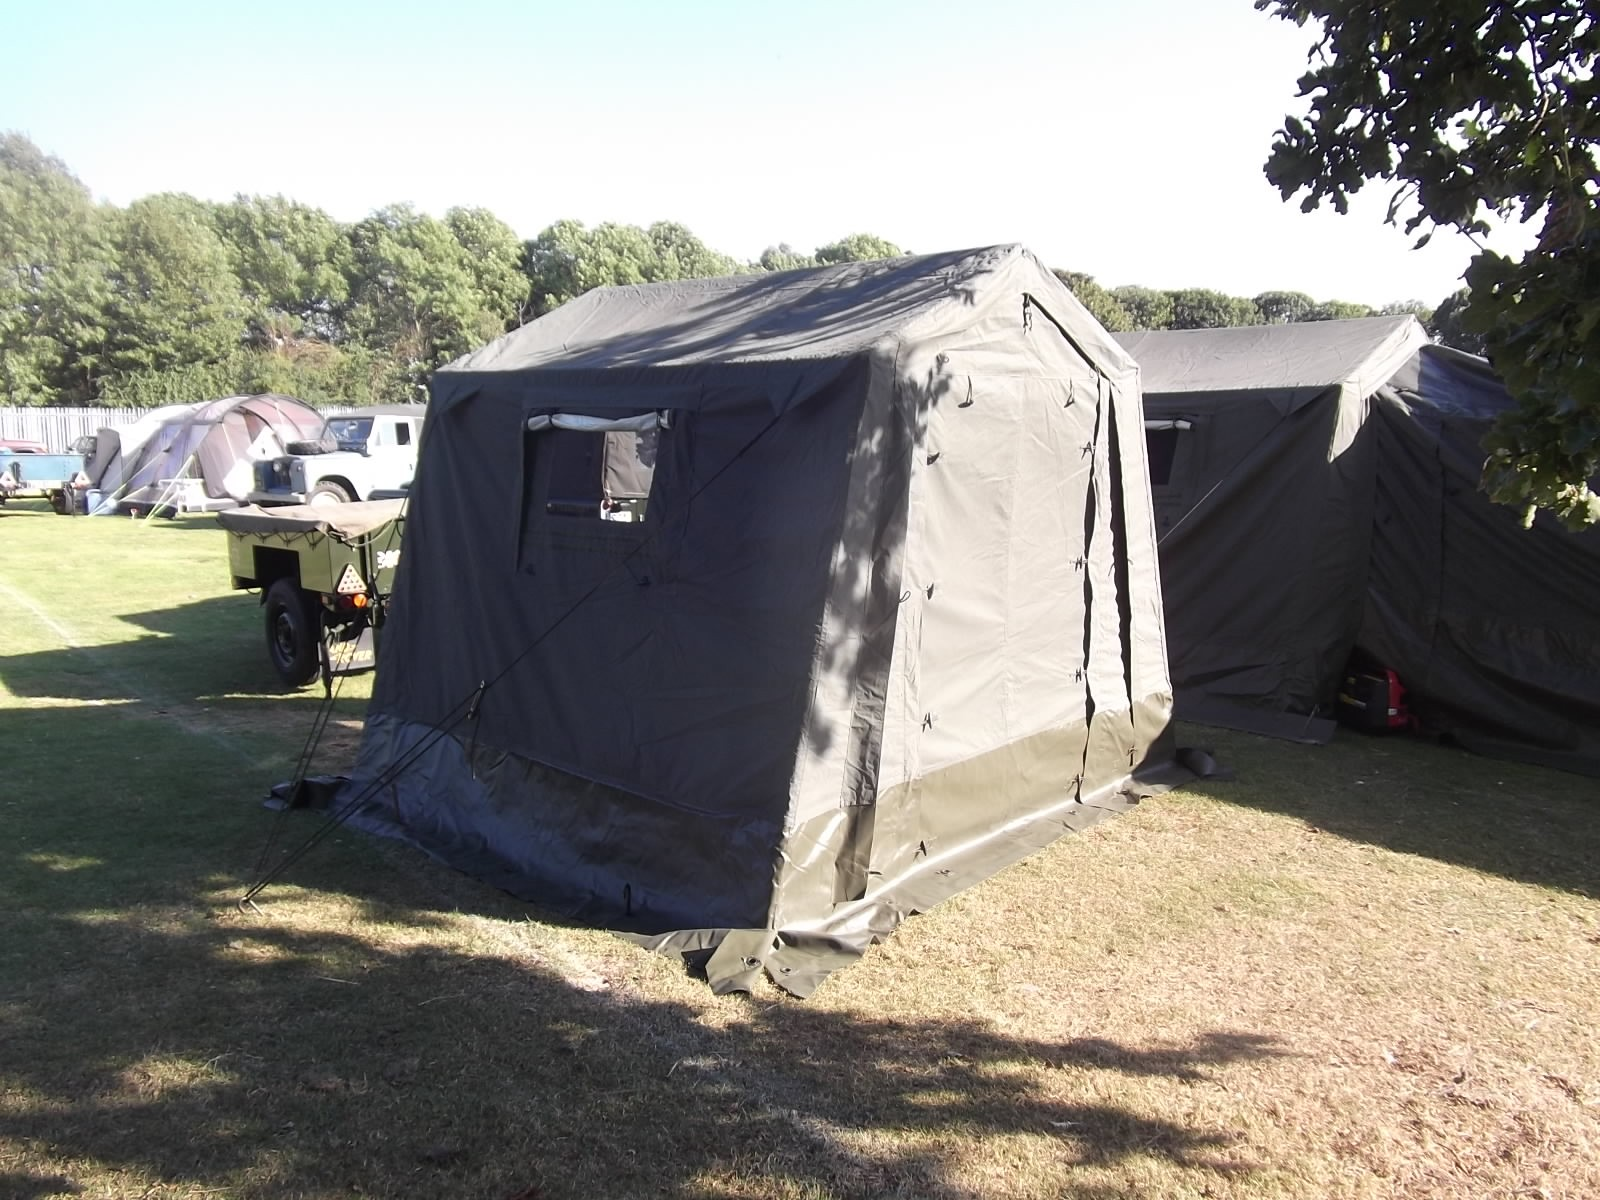 Ex British Army 9u0027 x 9u0027 Command Post (Wolf) Tent- Unissued & British Army 9u0027 x 9u0027 Command Post (Wolf) Tent- Unissued